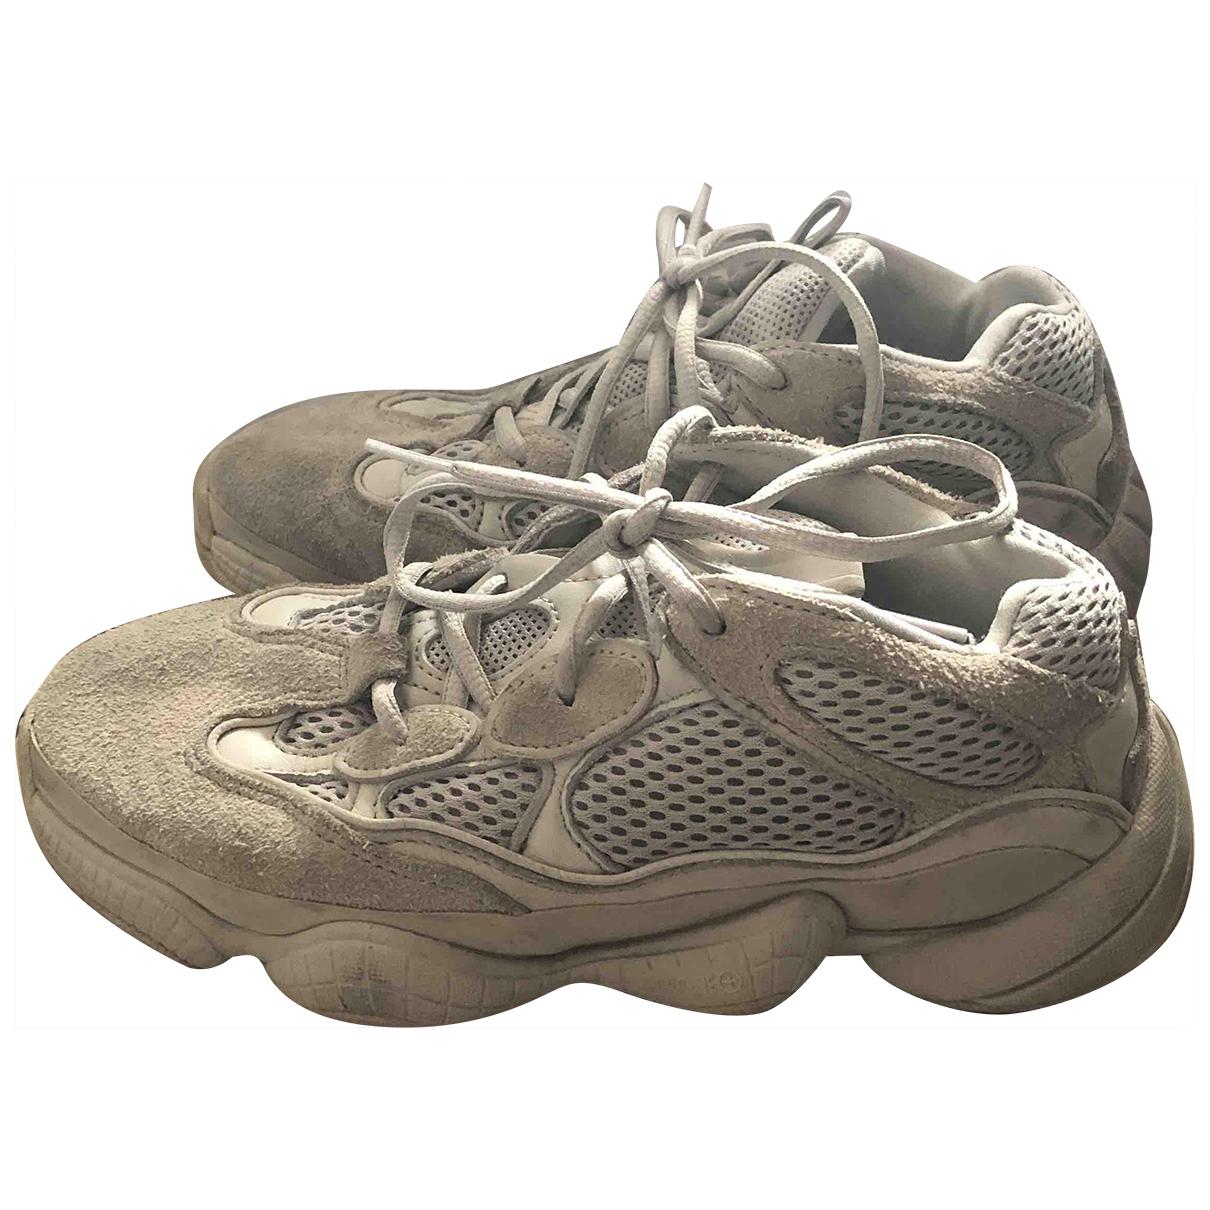 Yeezy X Adidas - Baskets 500 pour femme en suede - beige